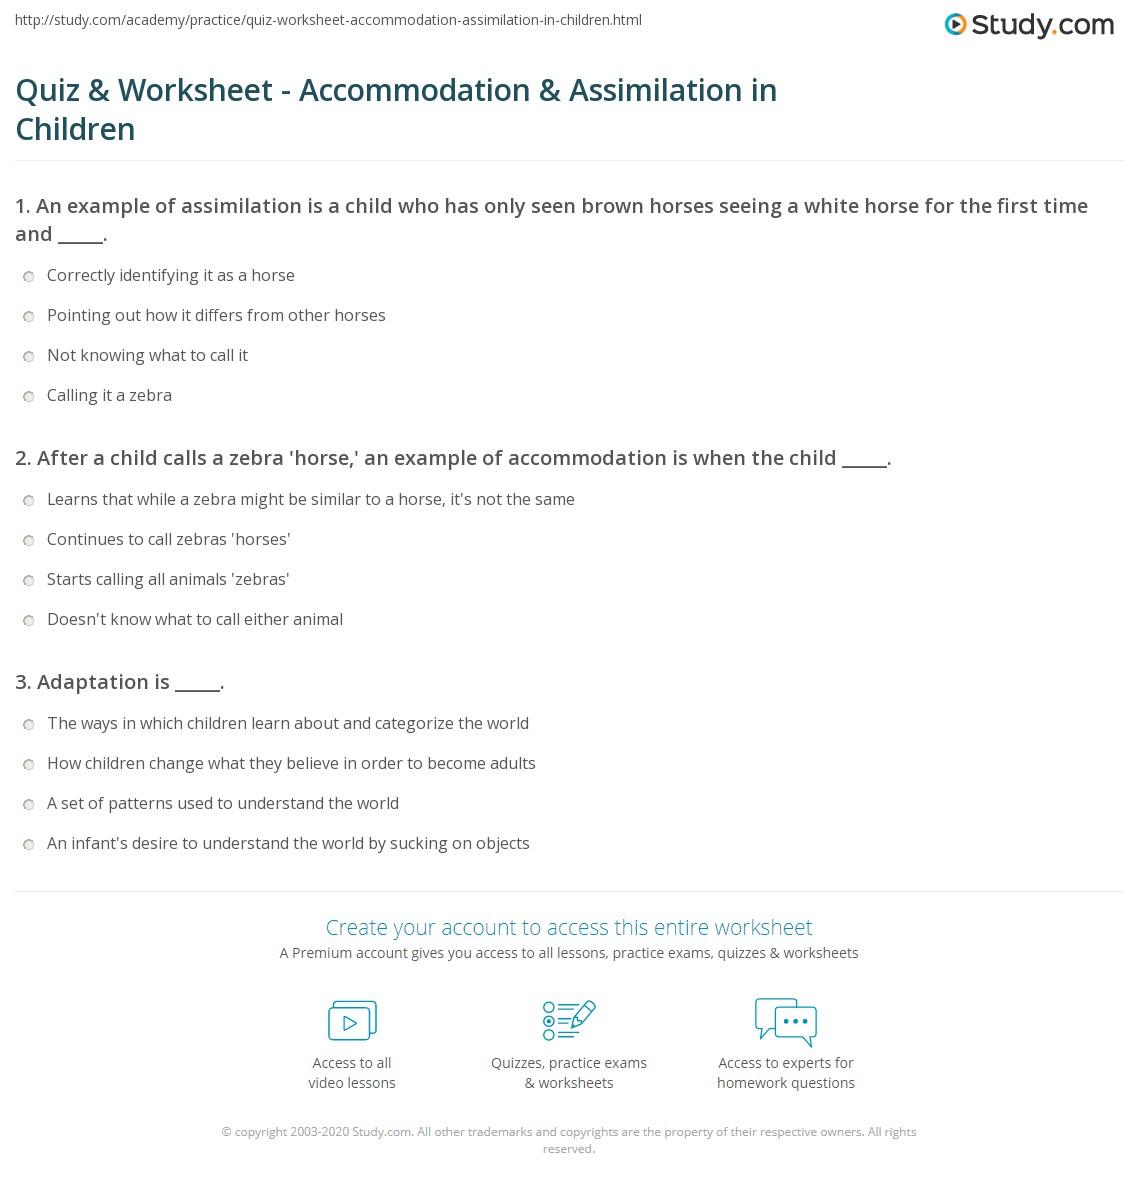 Quiz Worksheet Accommodation Assimilation In Children Study